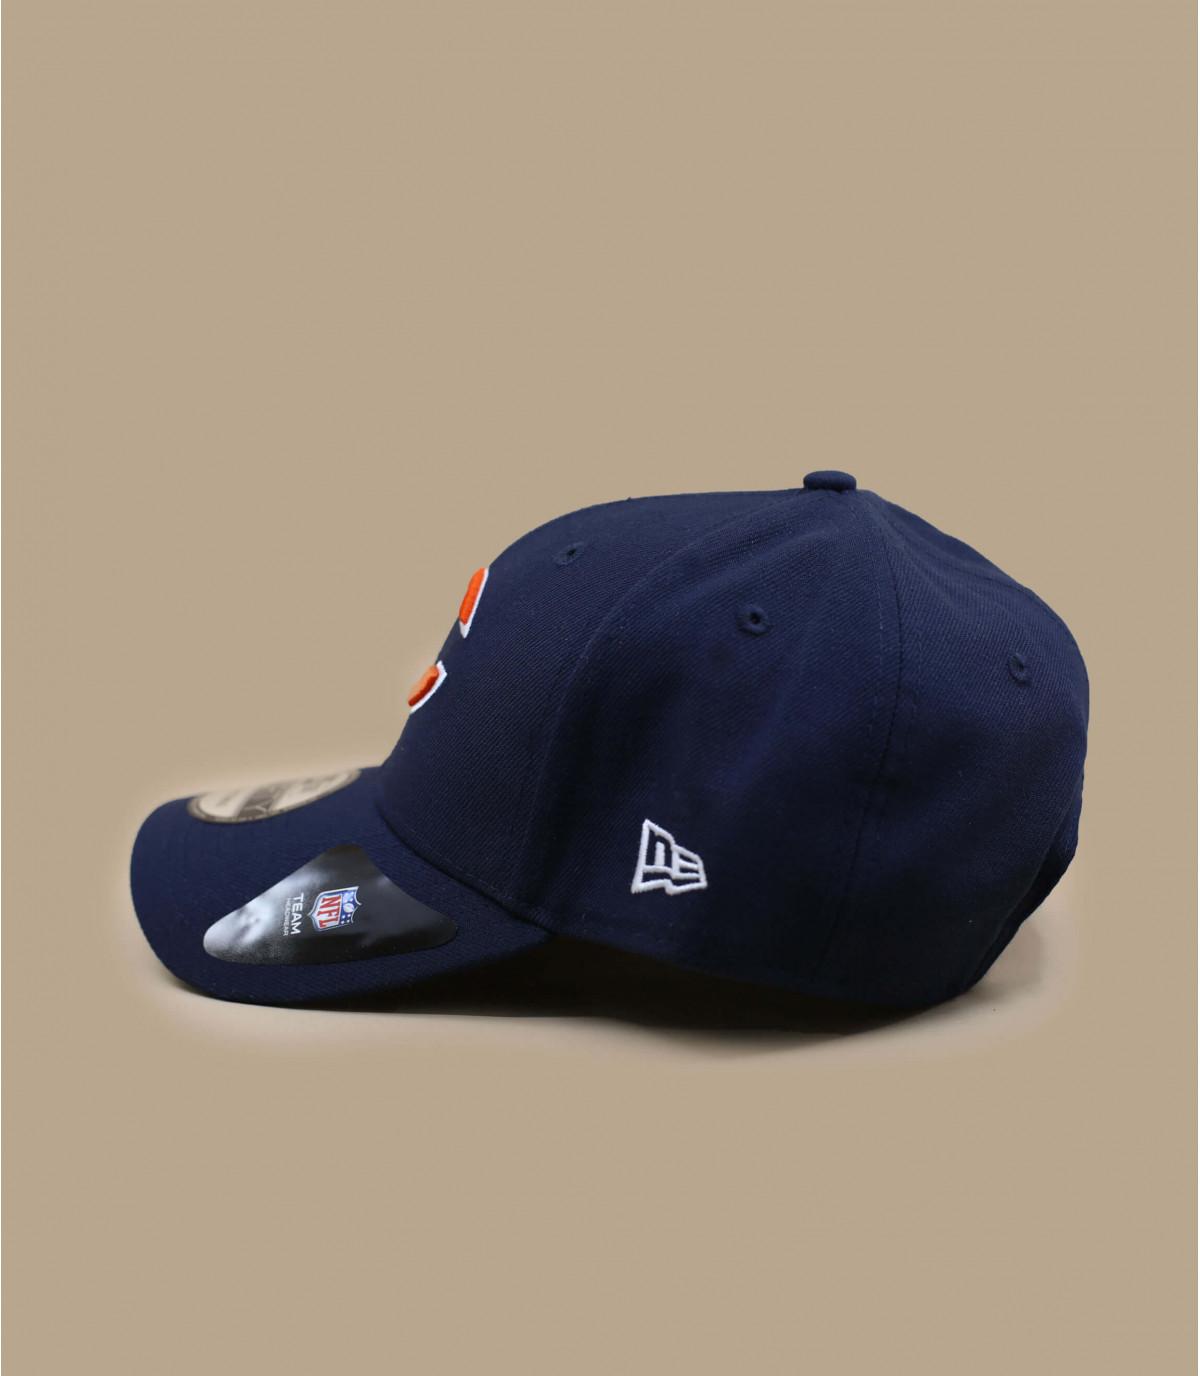 Orsi curva blu navy cap